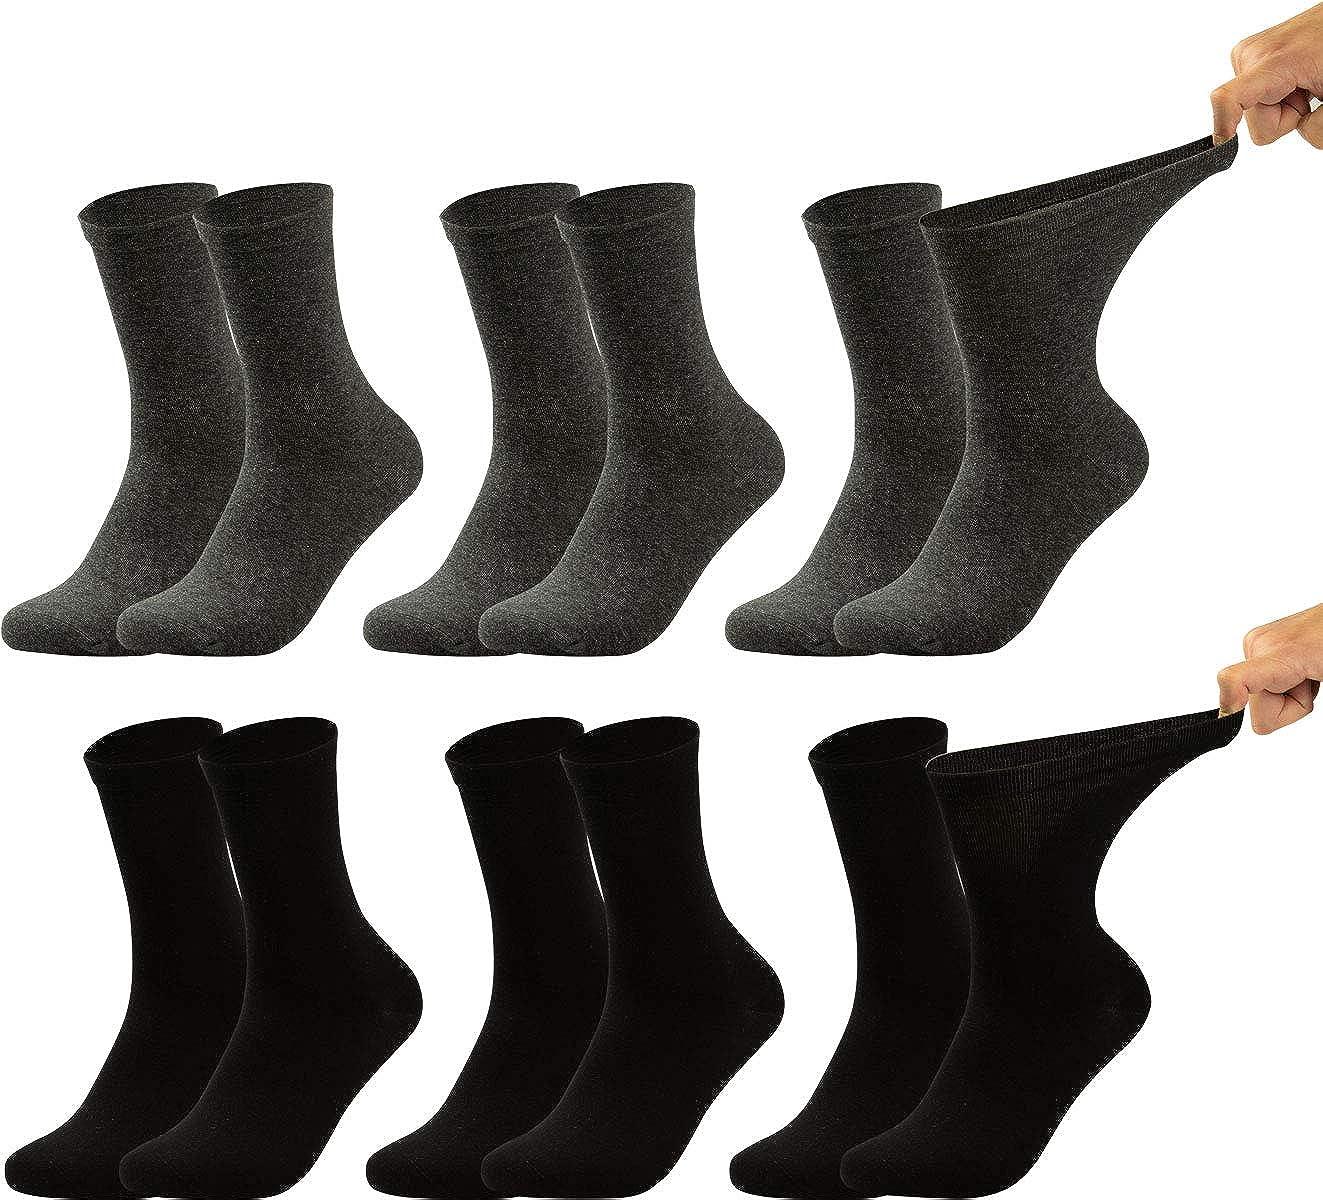 calzini sanitari sensibili completamente privi di gomma e di cuciture pacco da 6 o da 8 Vitasox calzini da uomo extra larghi in cotone